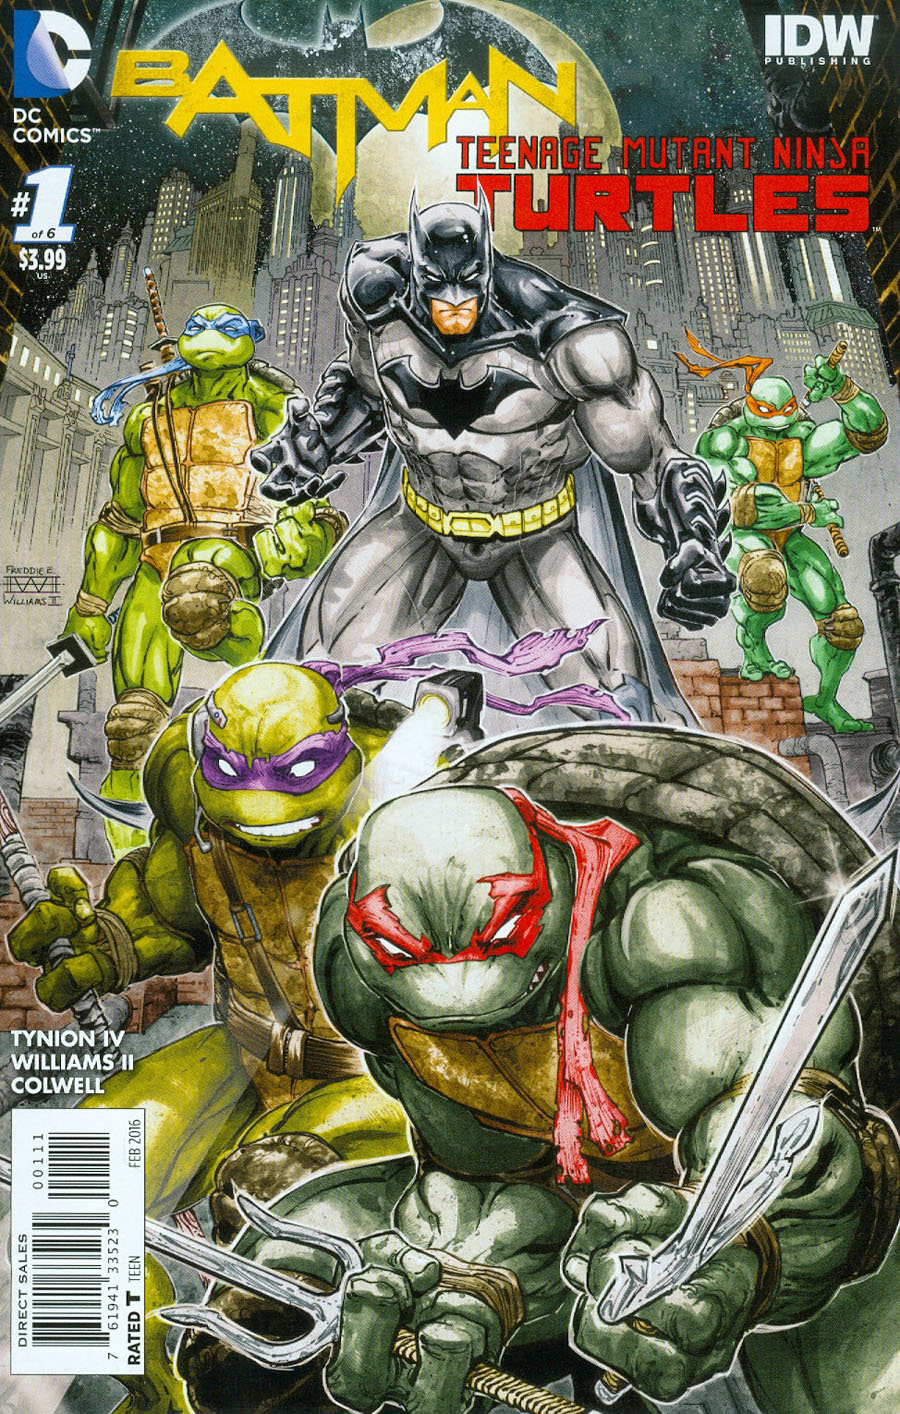 Batman Teenage Mutant Ninja Turtles #1 Cover A 1st Ptg Regular Freddie E Williams II Cover